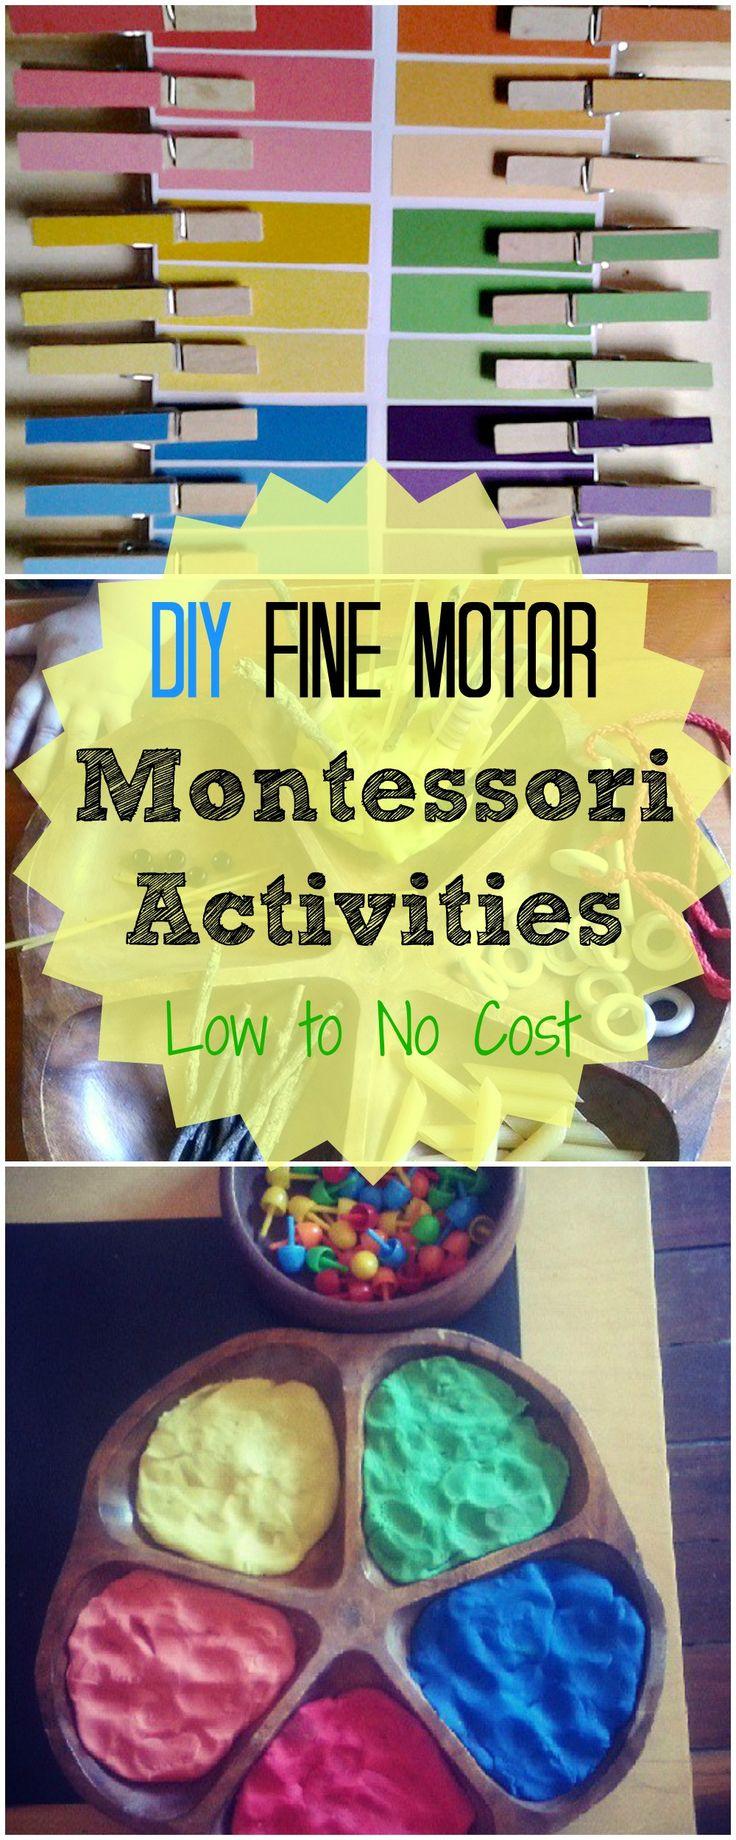 Activités bricolage motricité fine Montessori